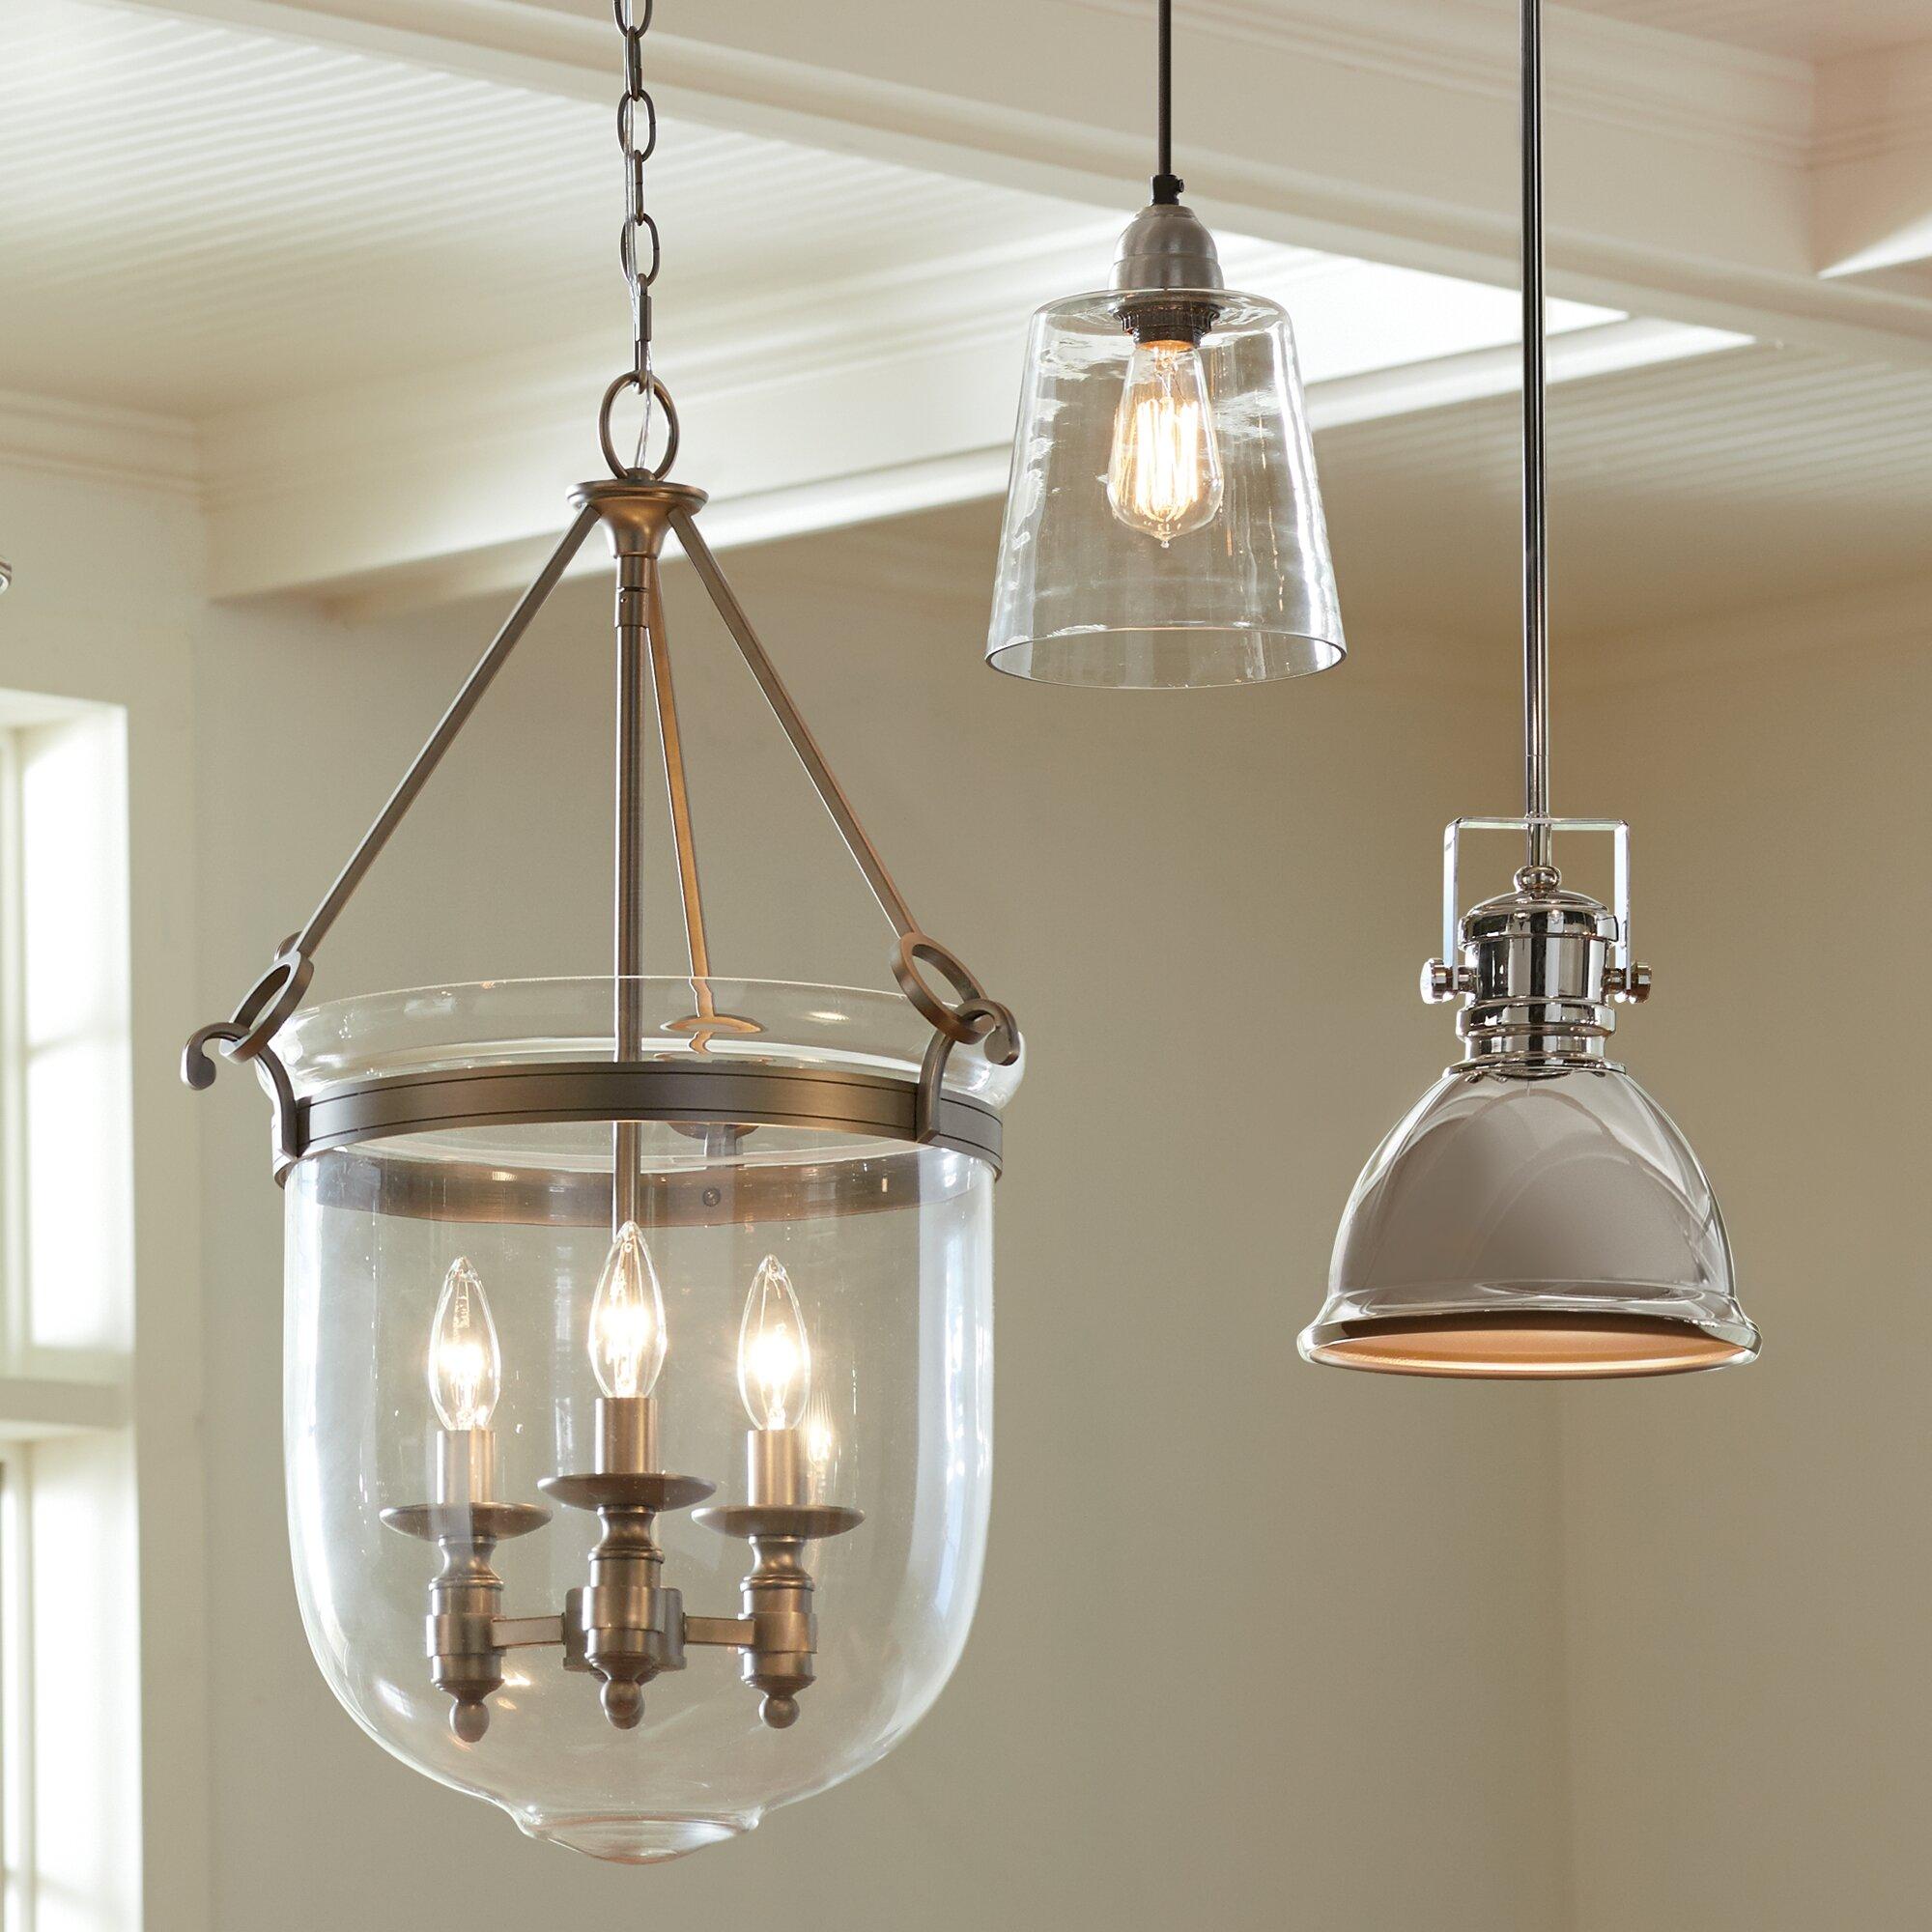 Oxford  Light Kitchen Pendant Lighting